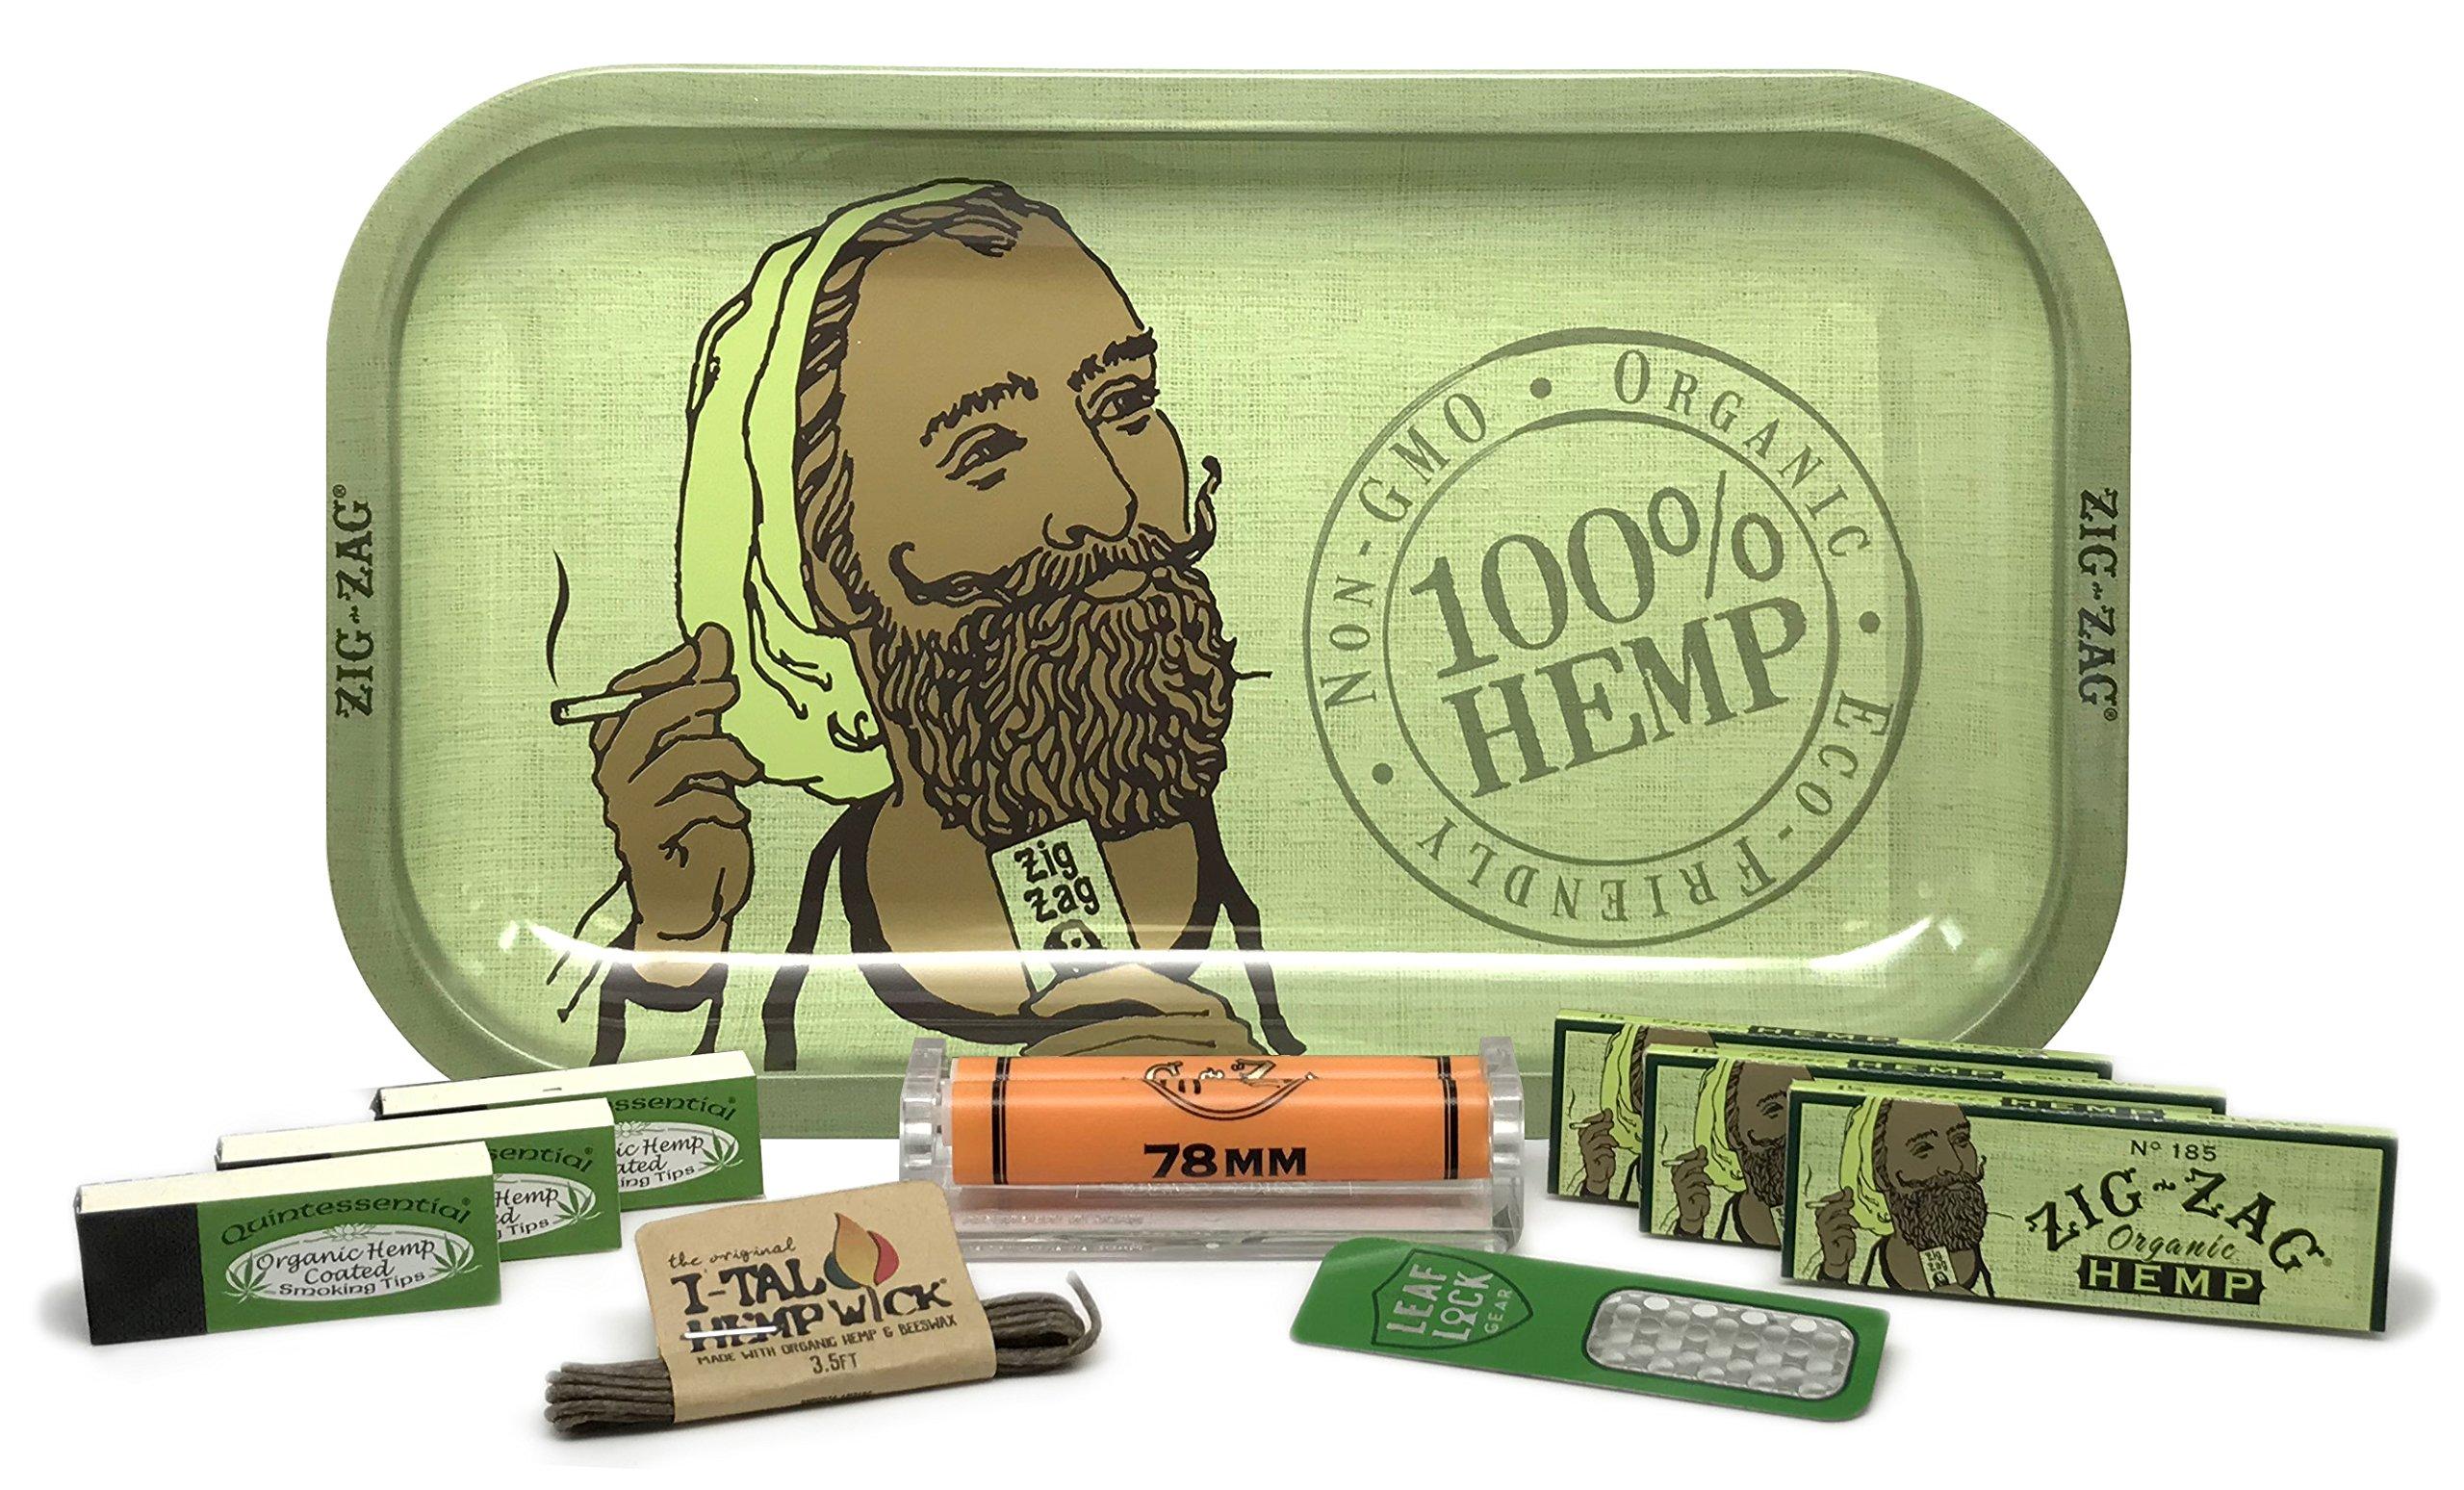 Zig Zag Organic Hemp Rolling Tray, 3 Packs of Zig Zag 1 1/4 Size Organic Hemp Papers, 3 Packs Quintessential Tips, 78mm Zig Zag Roller, ITal Hemp Wick with Leaf Lock Gear Grinder Card - 10 Item Bundle by Zig Zag, Leaf Lock Gear